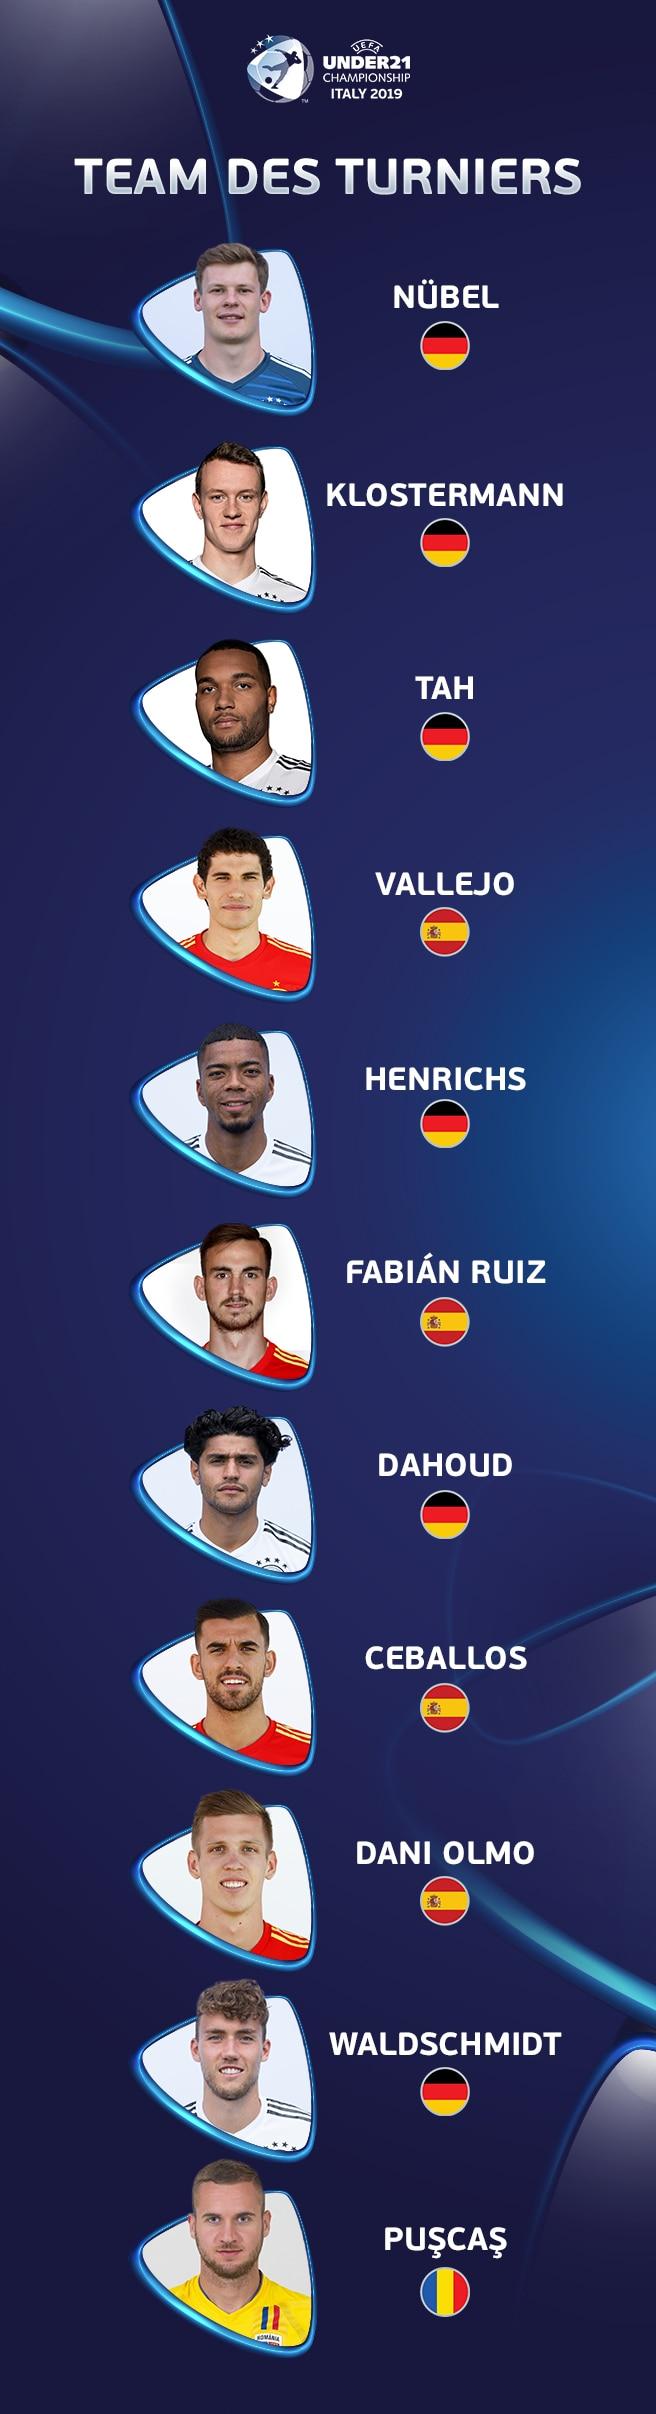 U21 EURO 2019 - Team des Turniers